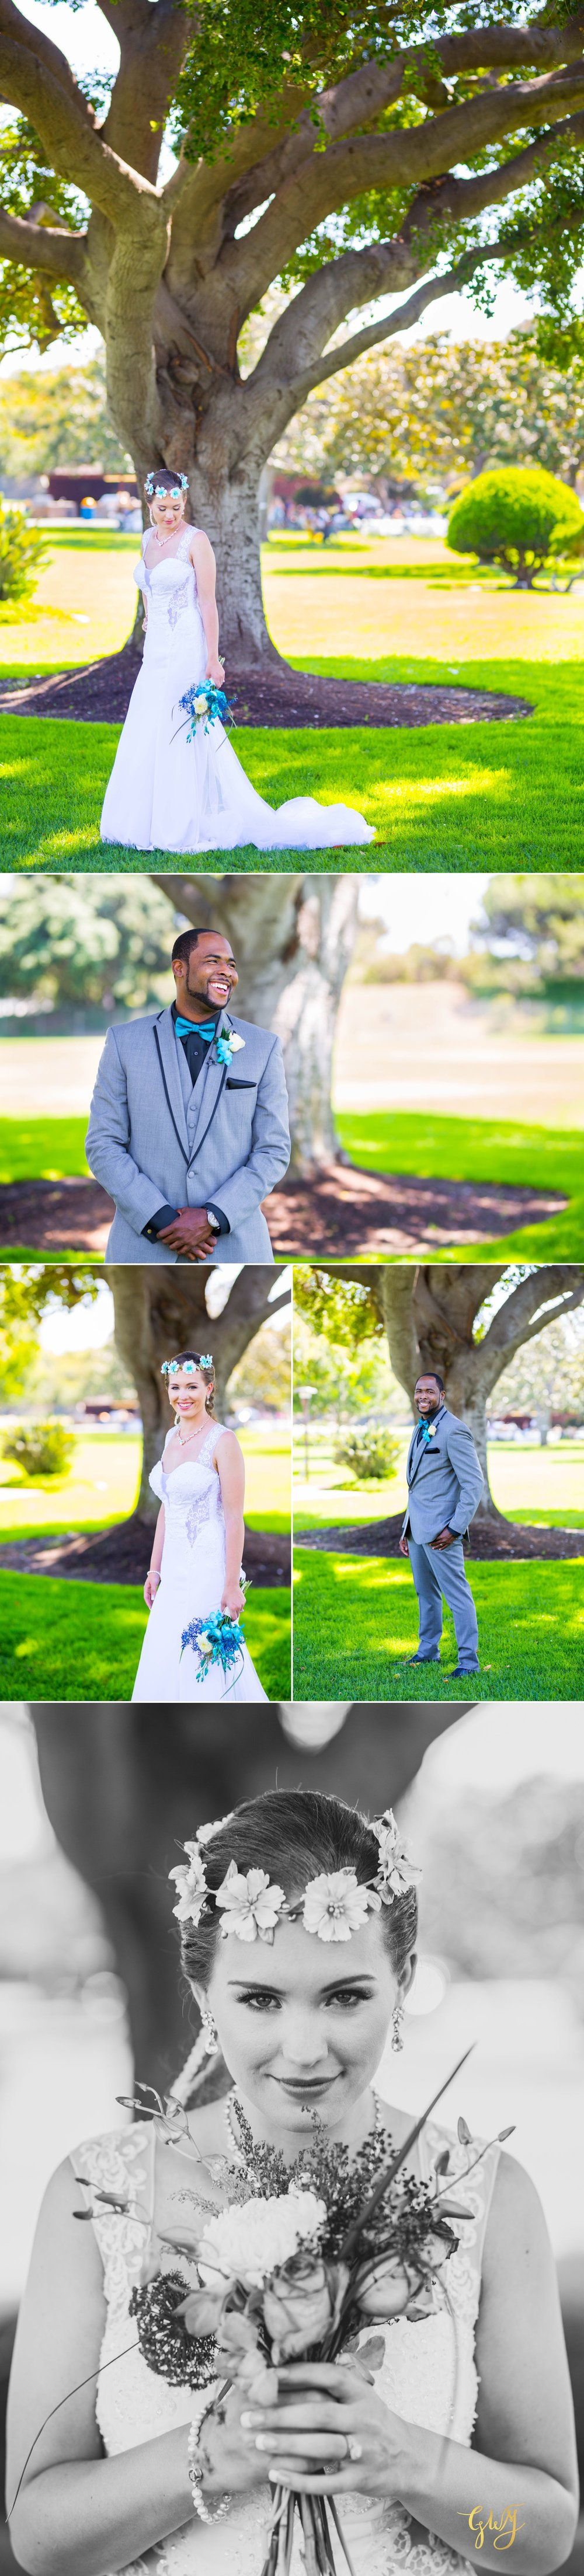 Rebecca + Torand El Segundo Chevron Employee Park Summer Barbados Bajan Wedding by Glass Woods Media 7.jpg